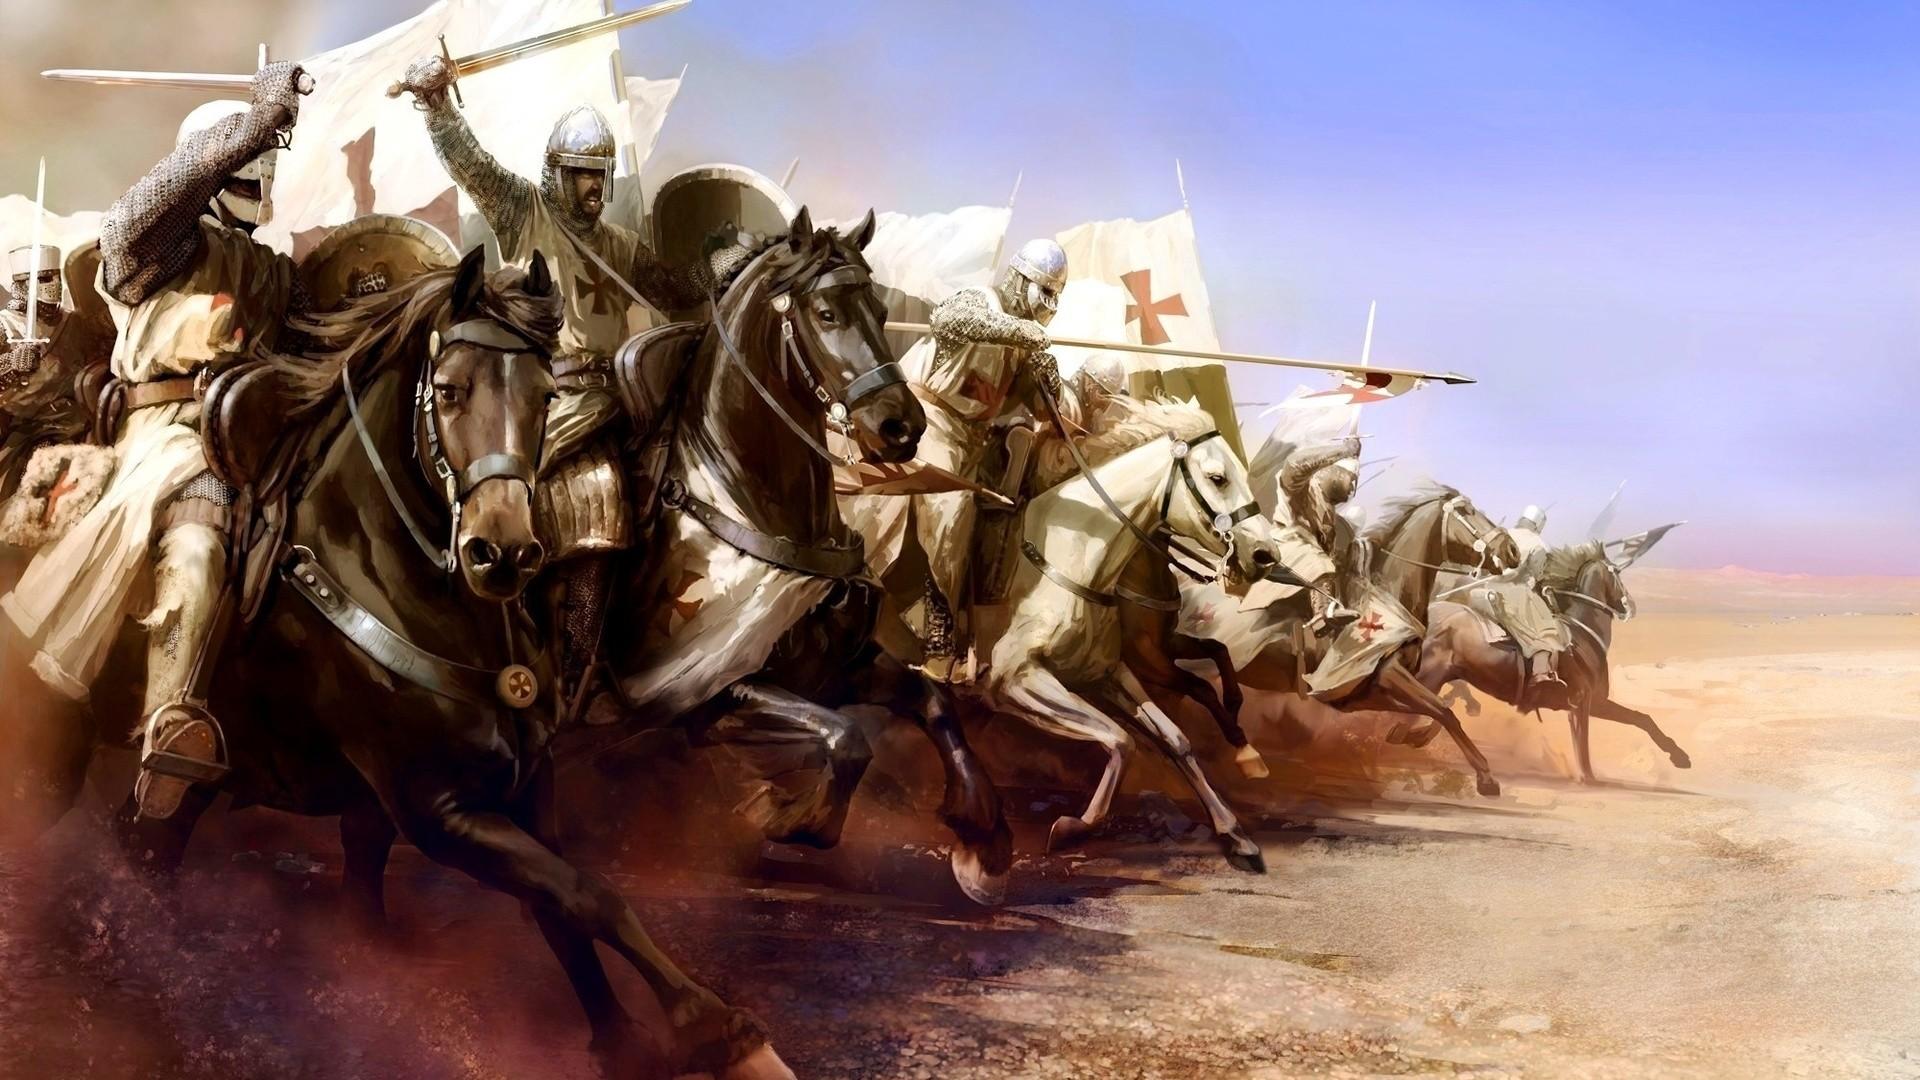 Templar free download wallpaper